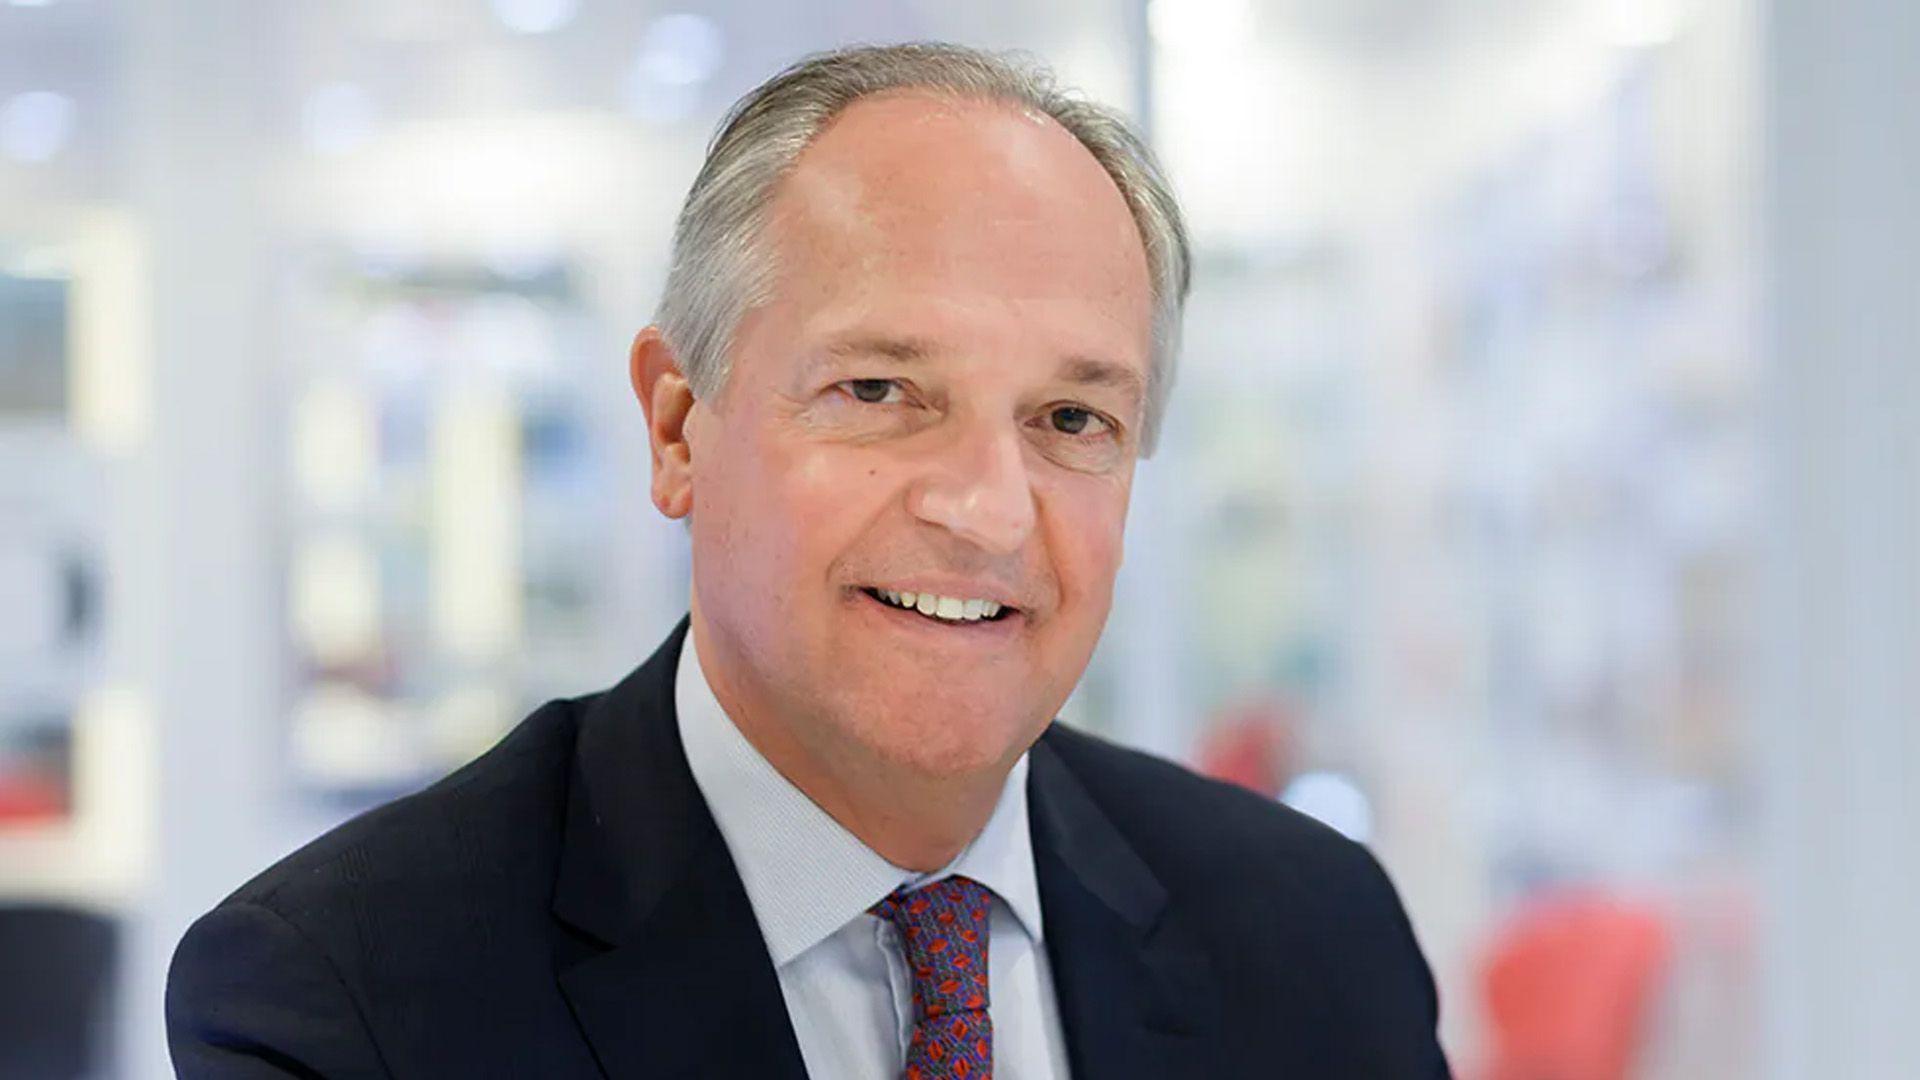 Paul Polman, former Unilever CEO